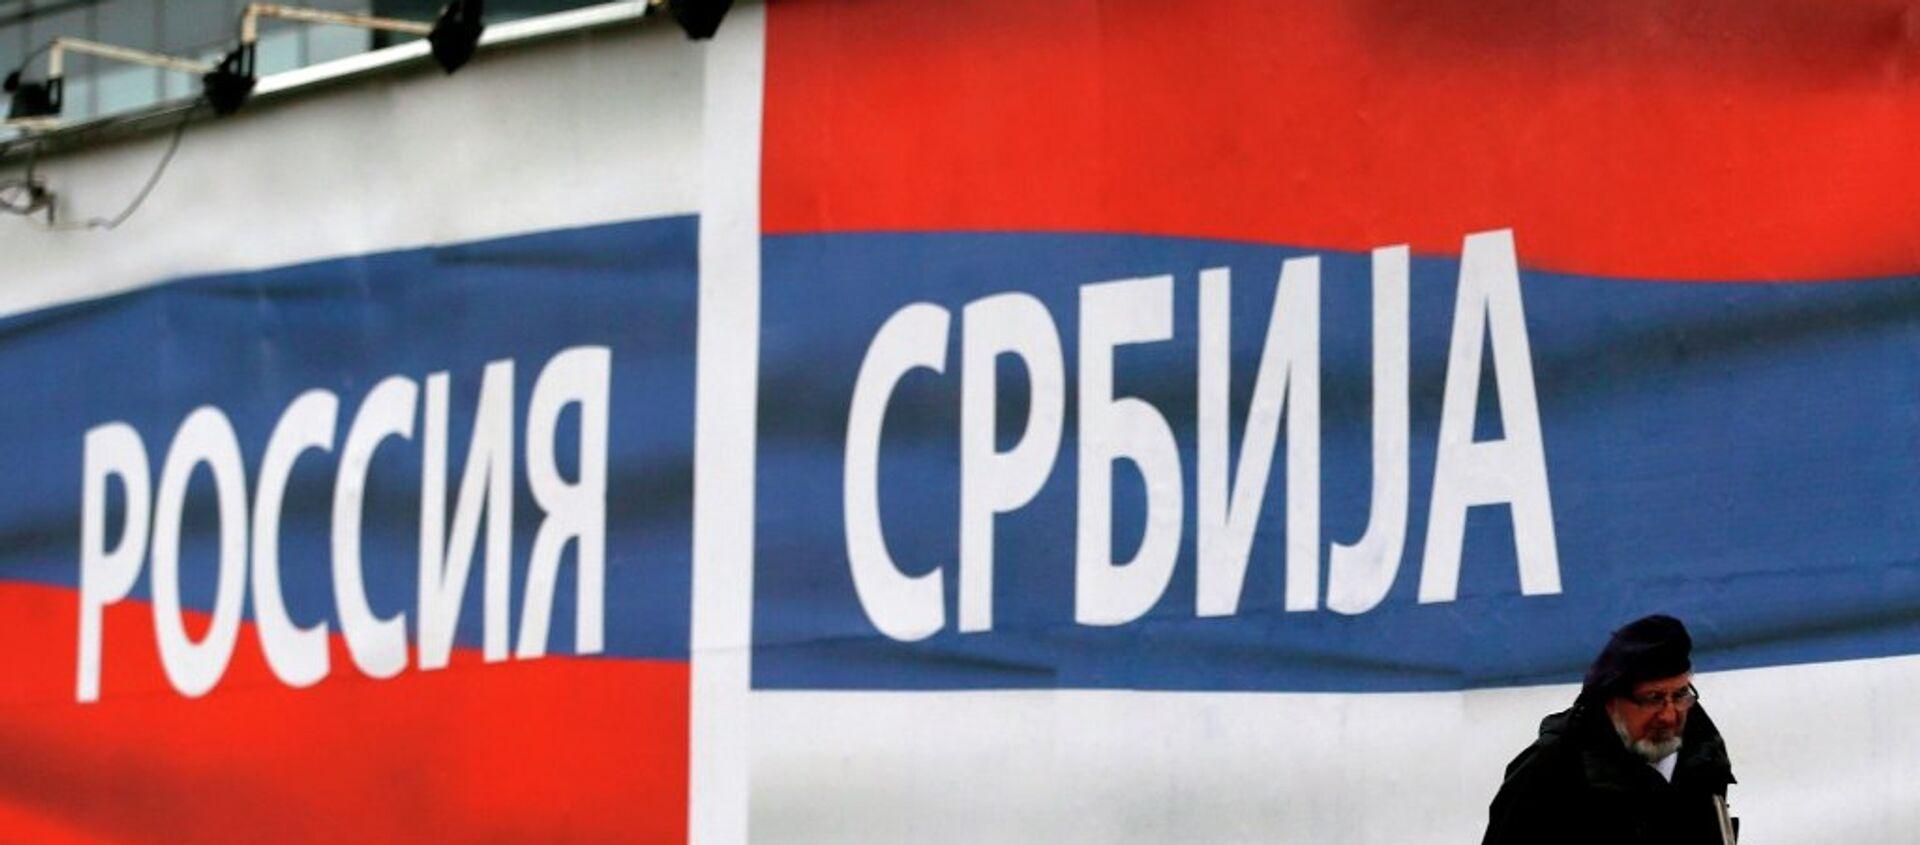 Plakat w Belgradzie, Serbia - Sputnik Polska, 1920, 03.09.2018